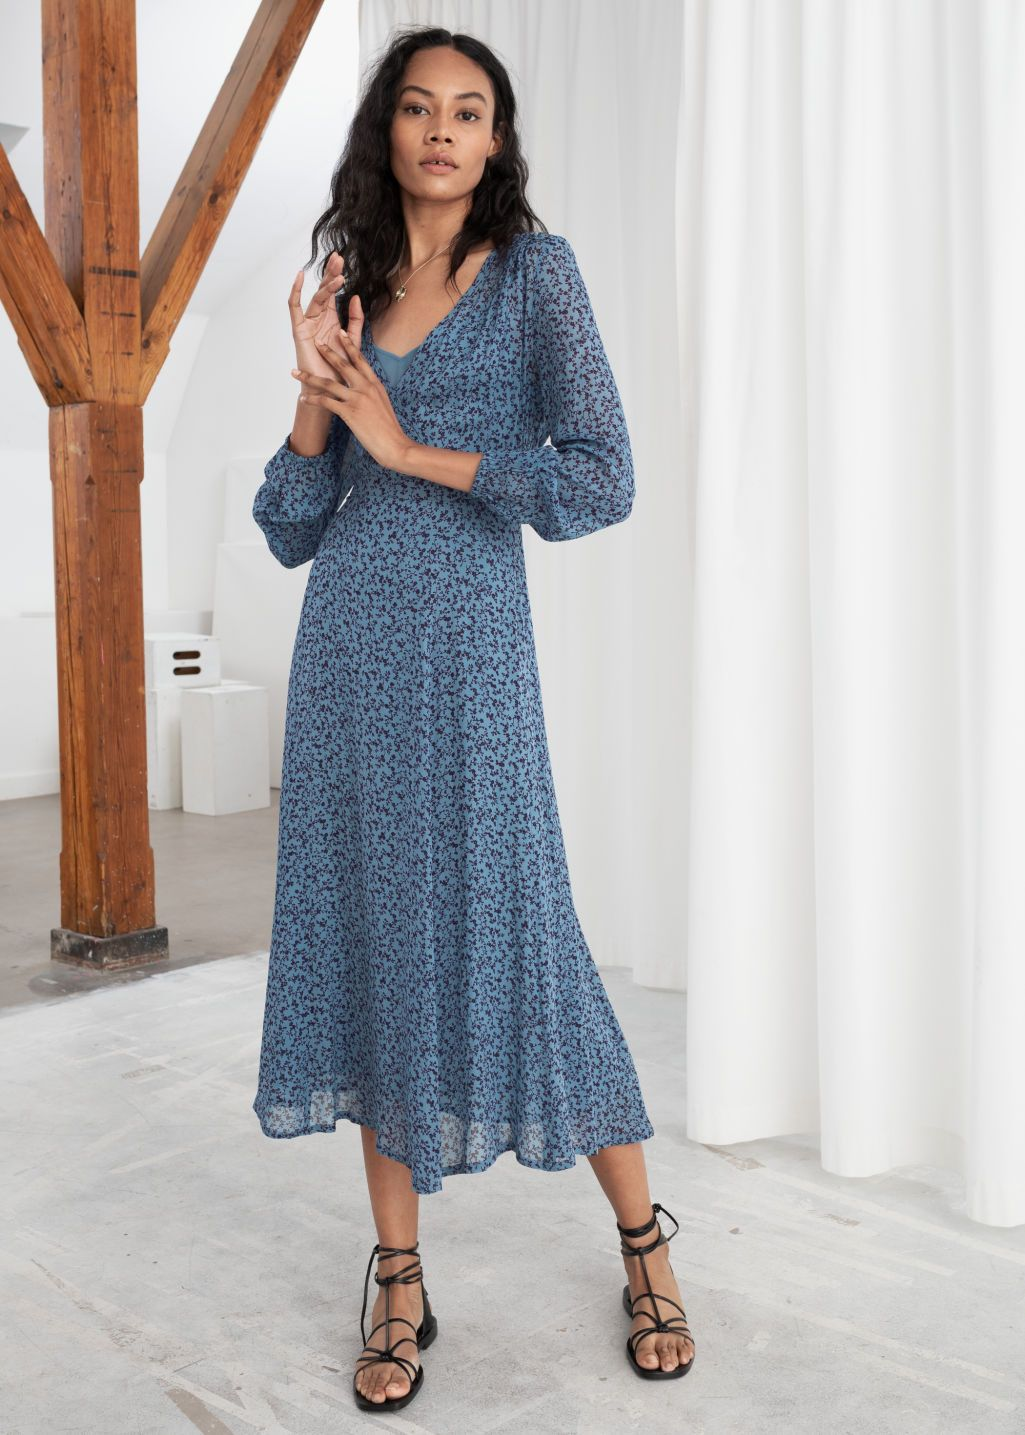 Sheer Printed Midi Dress Micro Floral Midi Dresses Other Stories Midi Dress Dresses Fashion